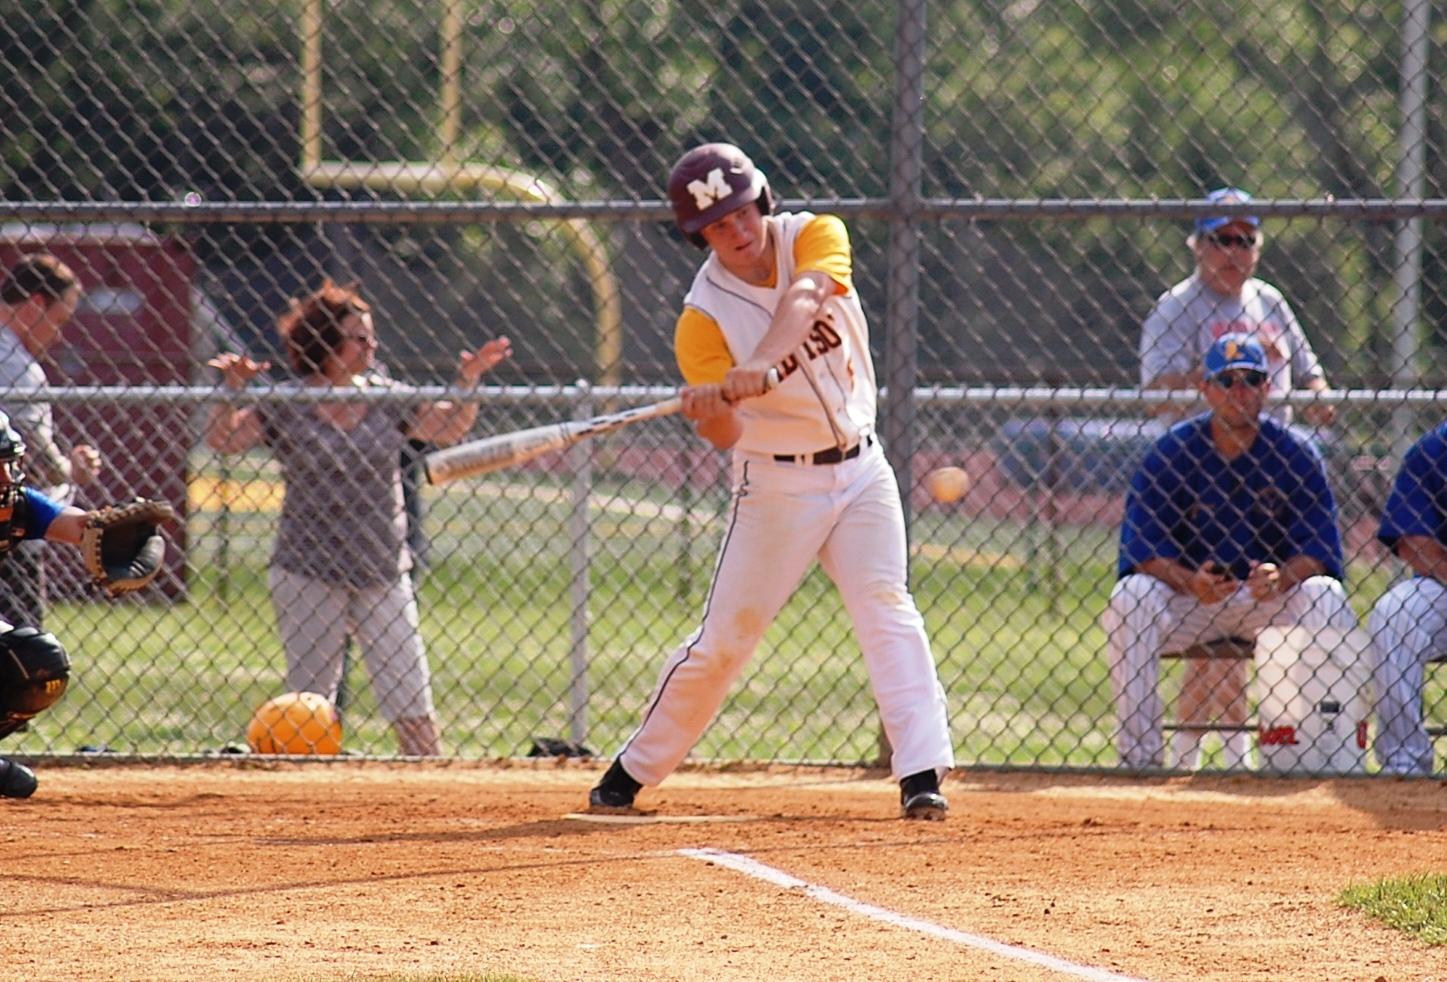 d44e4d95d86c2ec2c965_lyndhurst_higgins_at_madison_baseball_state_playoffs_5-29-12_109.jpg